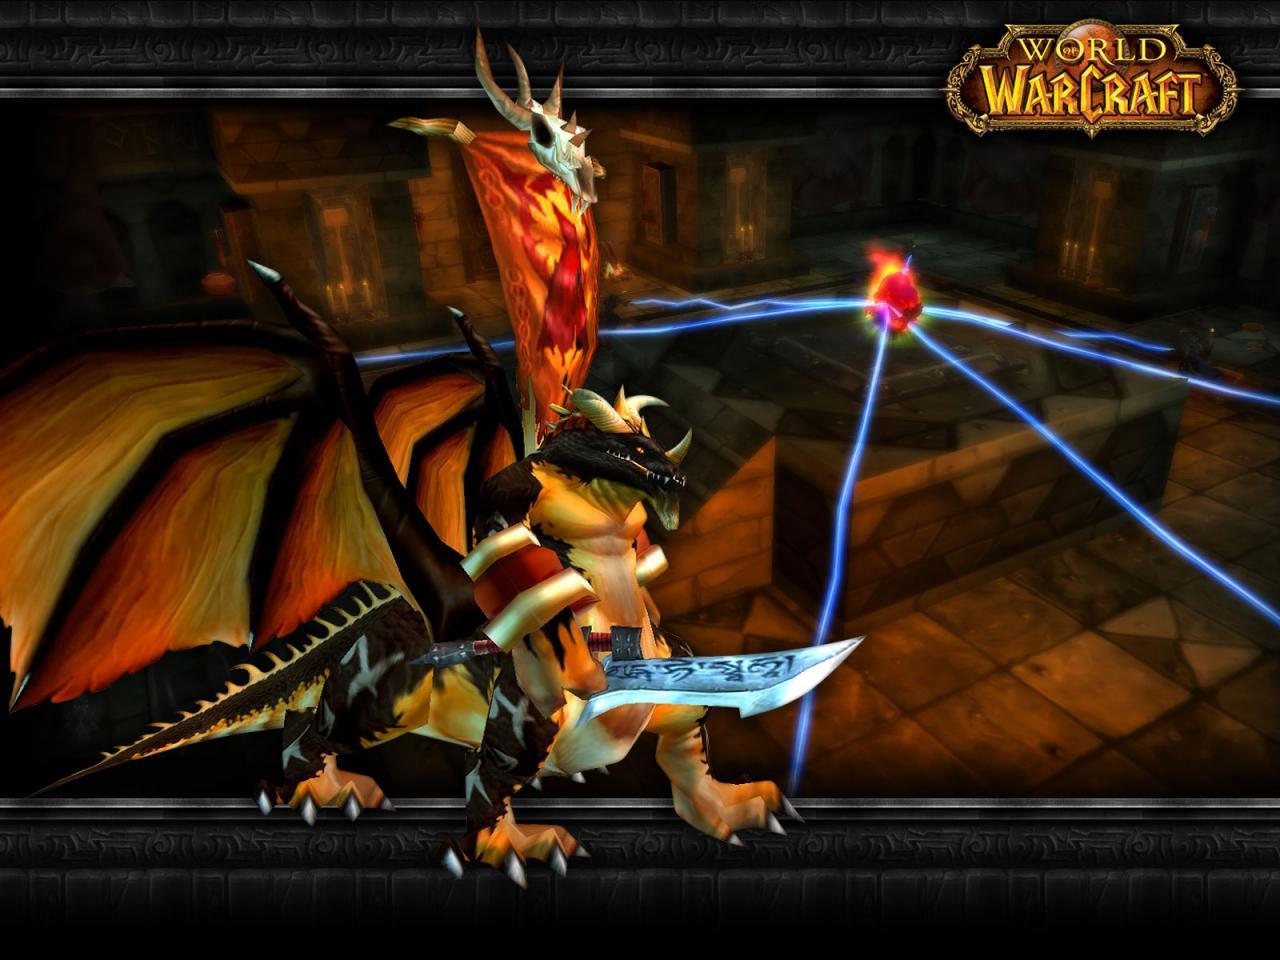 Wallpaper Word of Warcraft WoW dragon kin